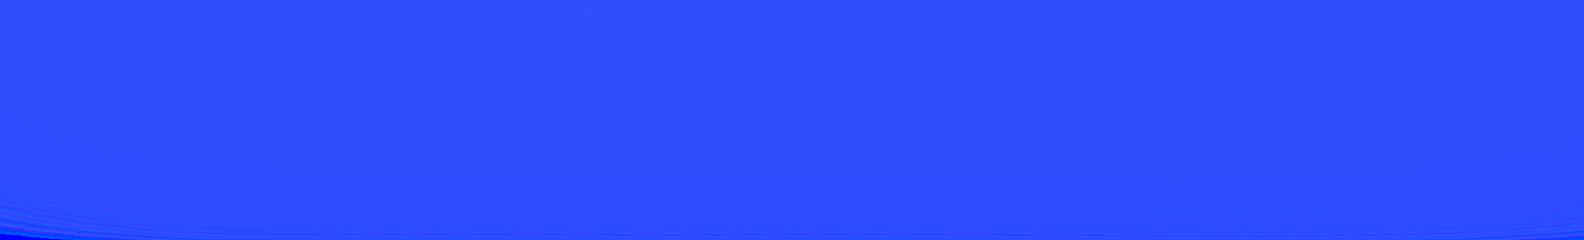 gradient overlay overlayedits gradients freetoedit blue kpop kpoplympics